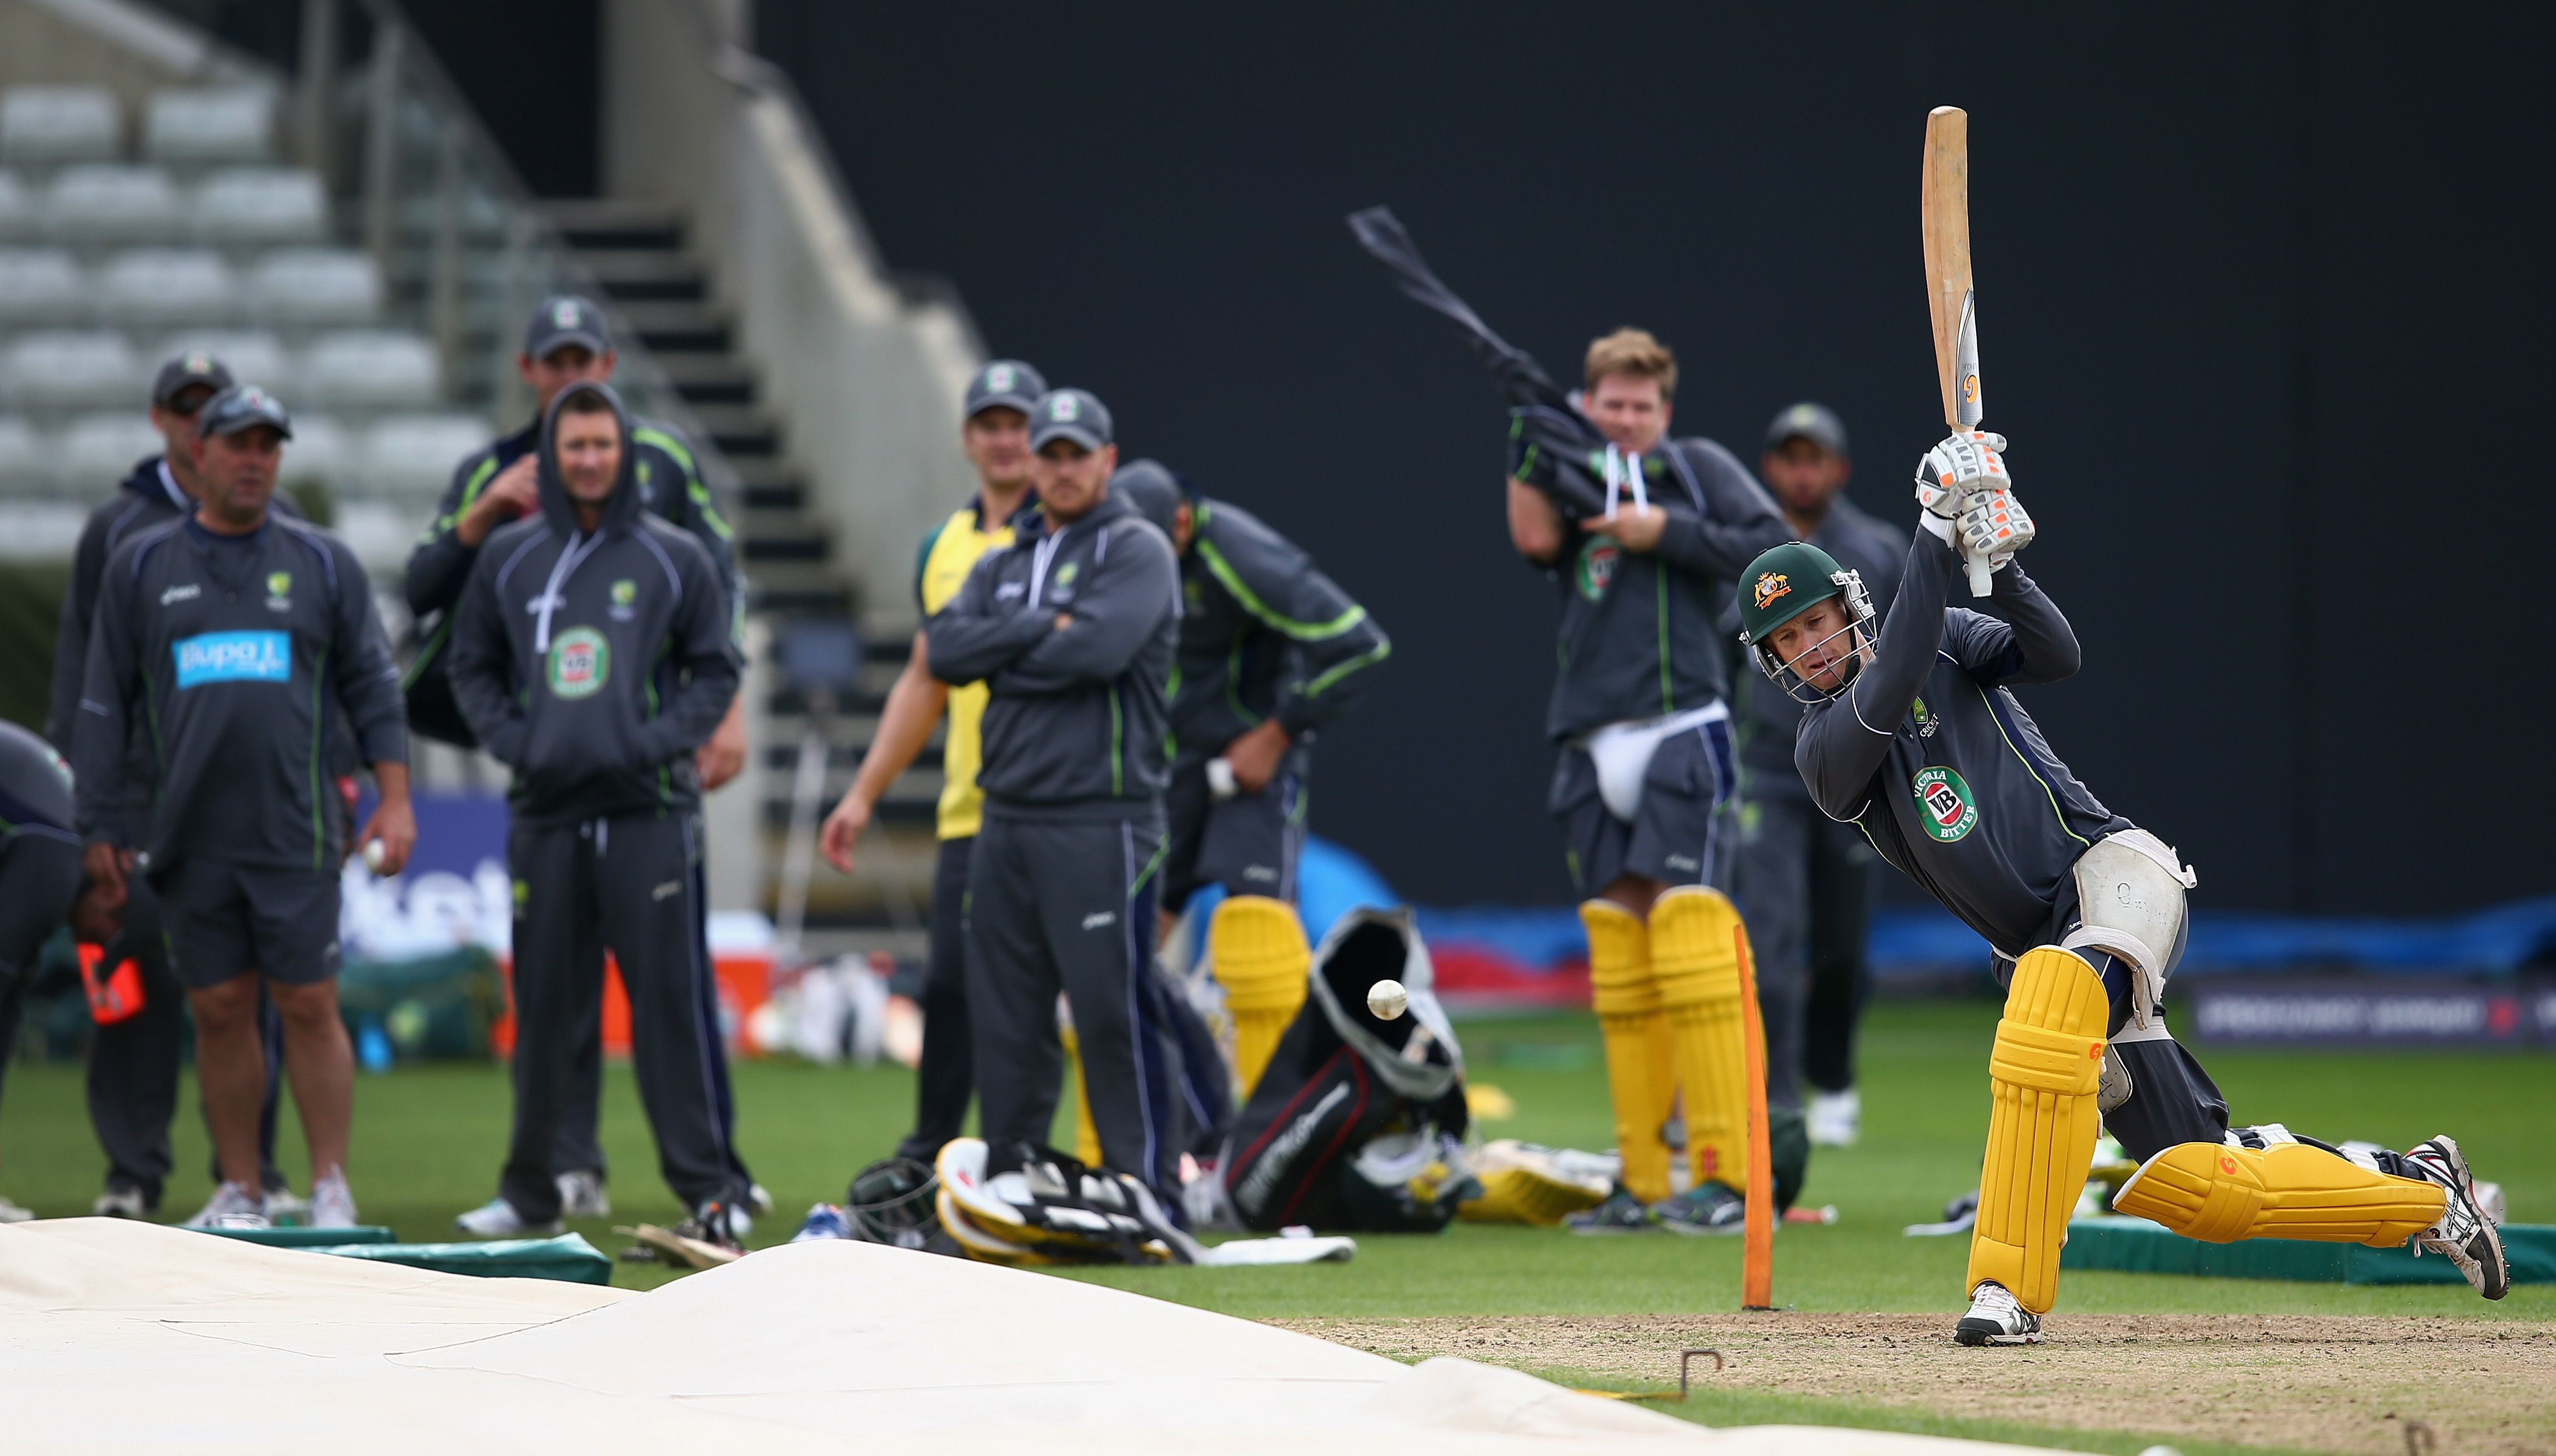 Pin by Australian Cricketers' Associa on Third ODI 2013